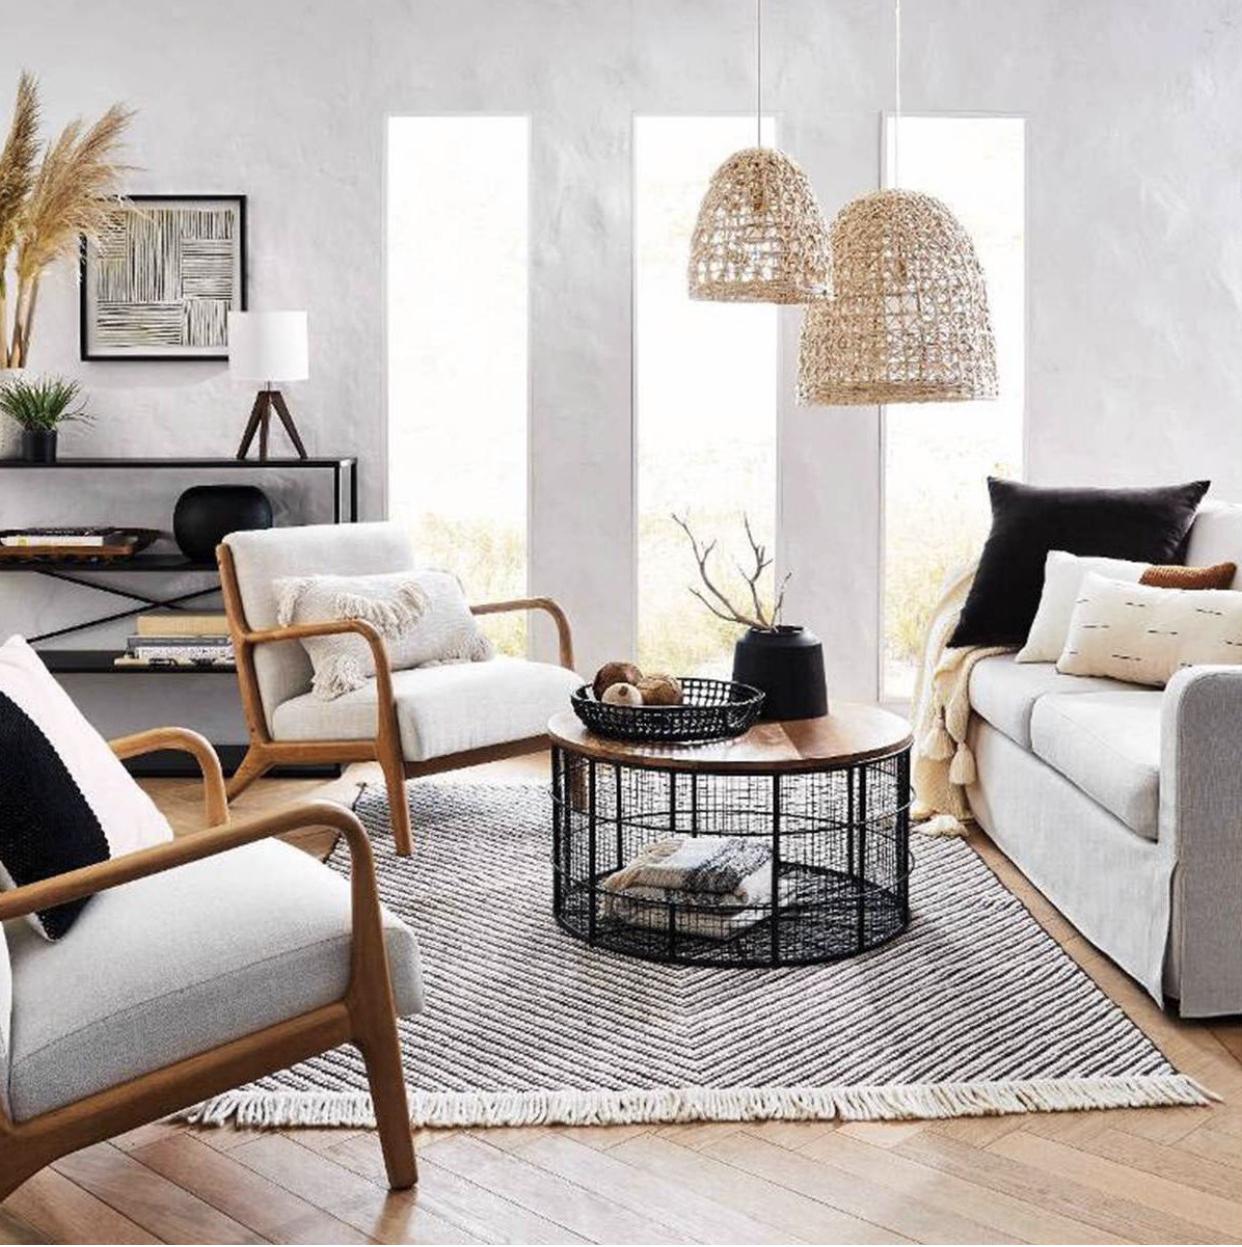 Large Seagrass Light Pendant Light Brown Includes Energy Efficient Light Bulb Opalhouse In 2020 Natural Living Room Natural Living Room Furniture Living Room Decor Furniture